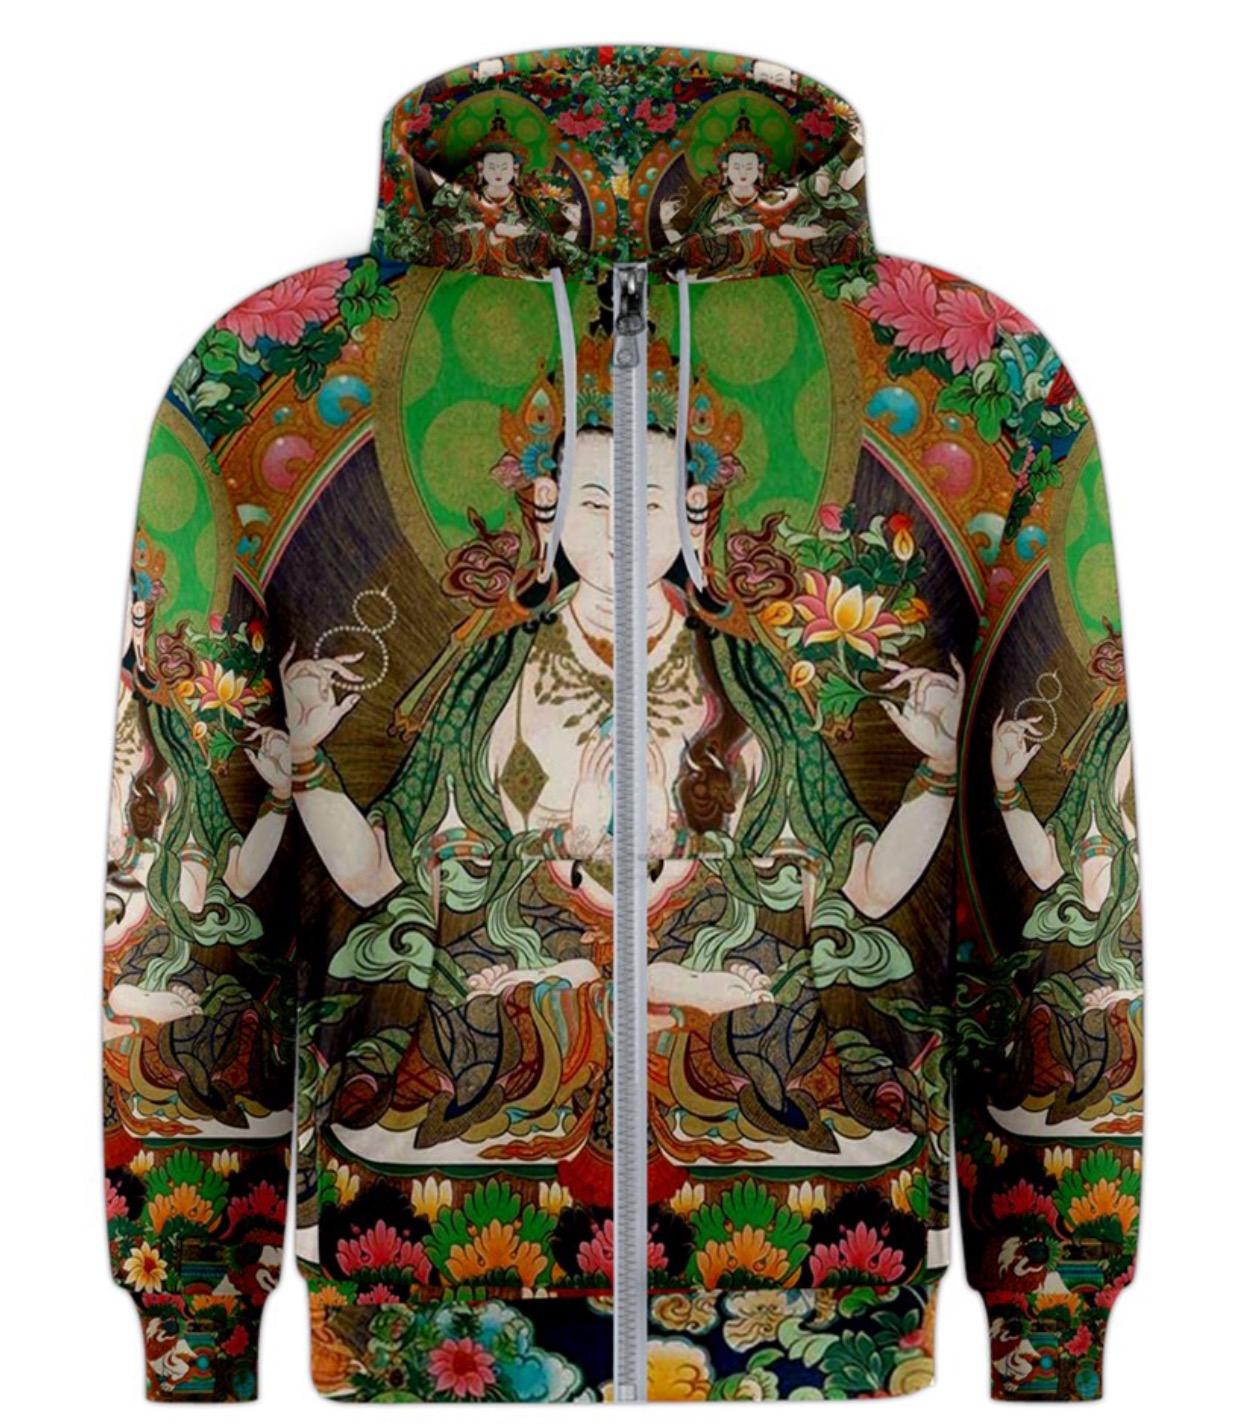 739376212e250 Aka rah Hoodie · JSIEBEL CLOTHING · Online Store Powered by Storenvy